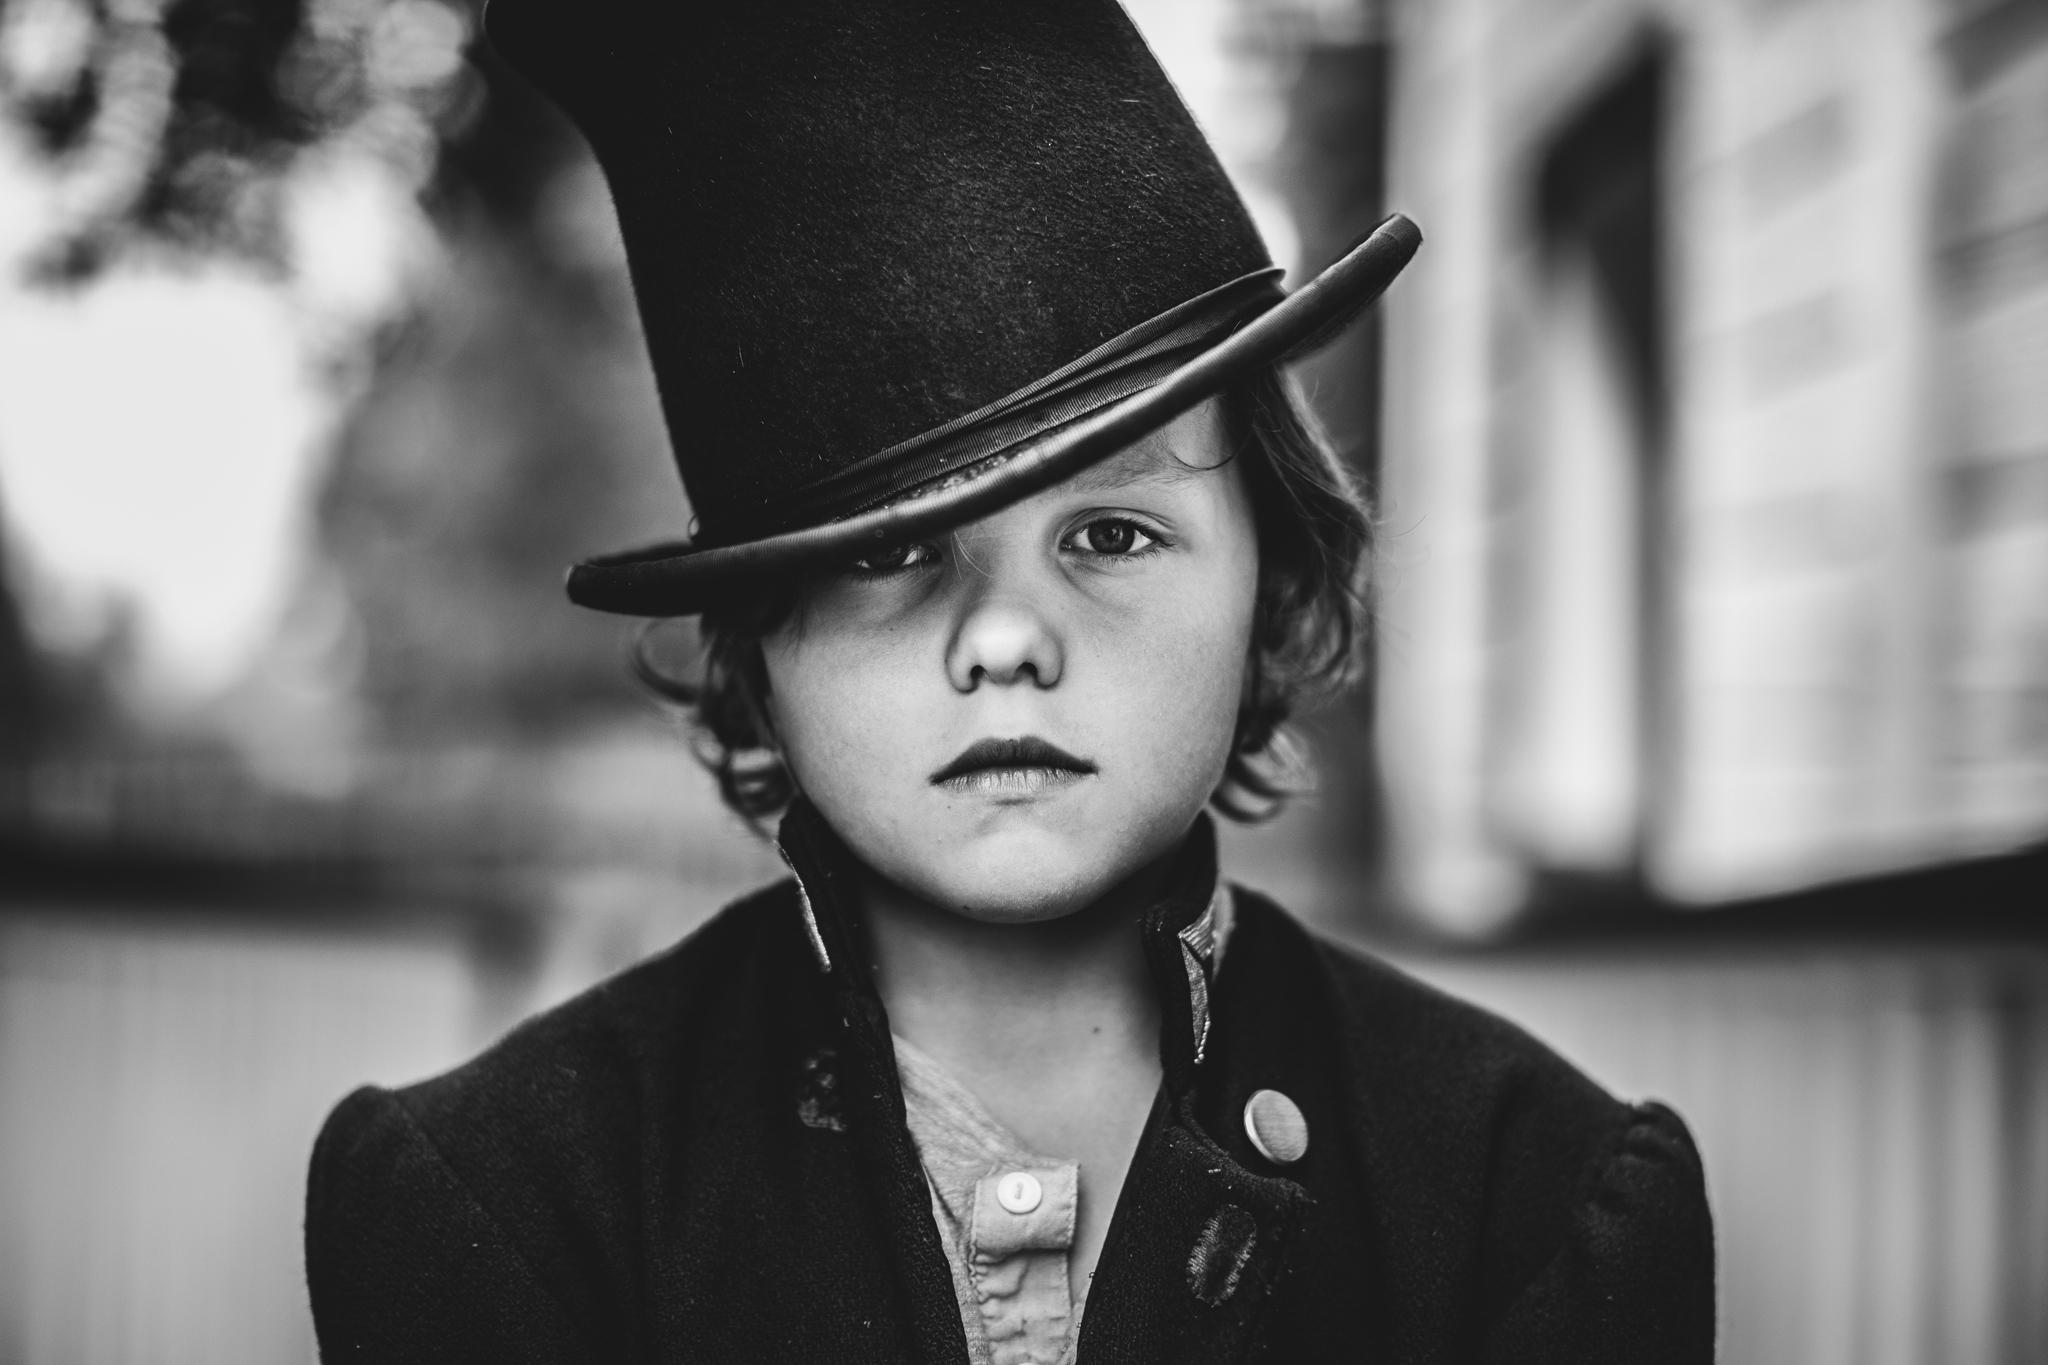 atti hat fort langley greatest showman portrait-6399.jpg